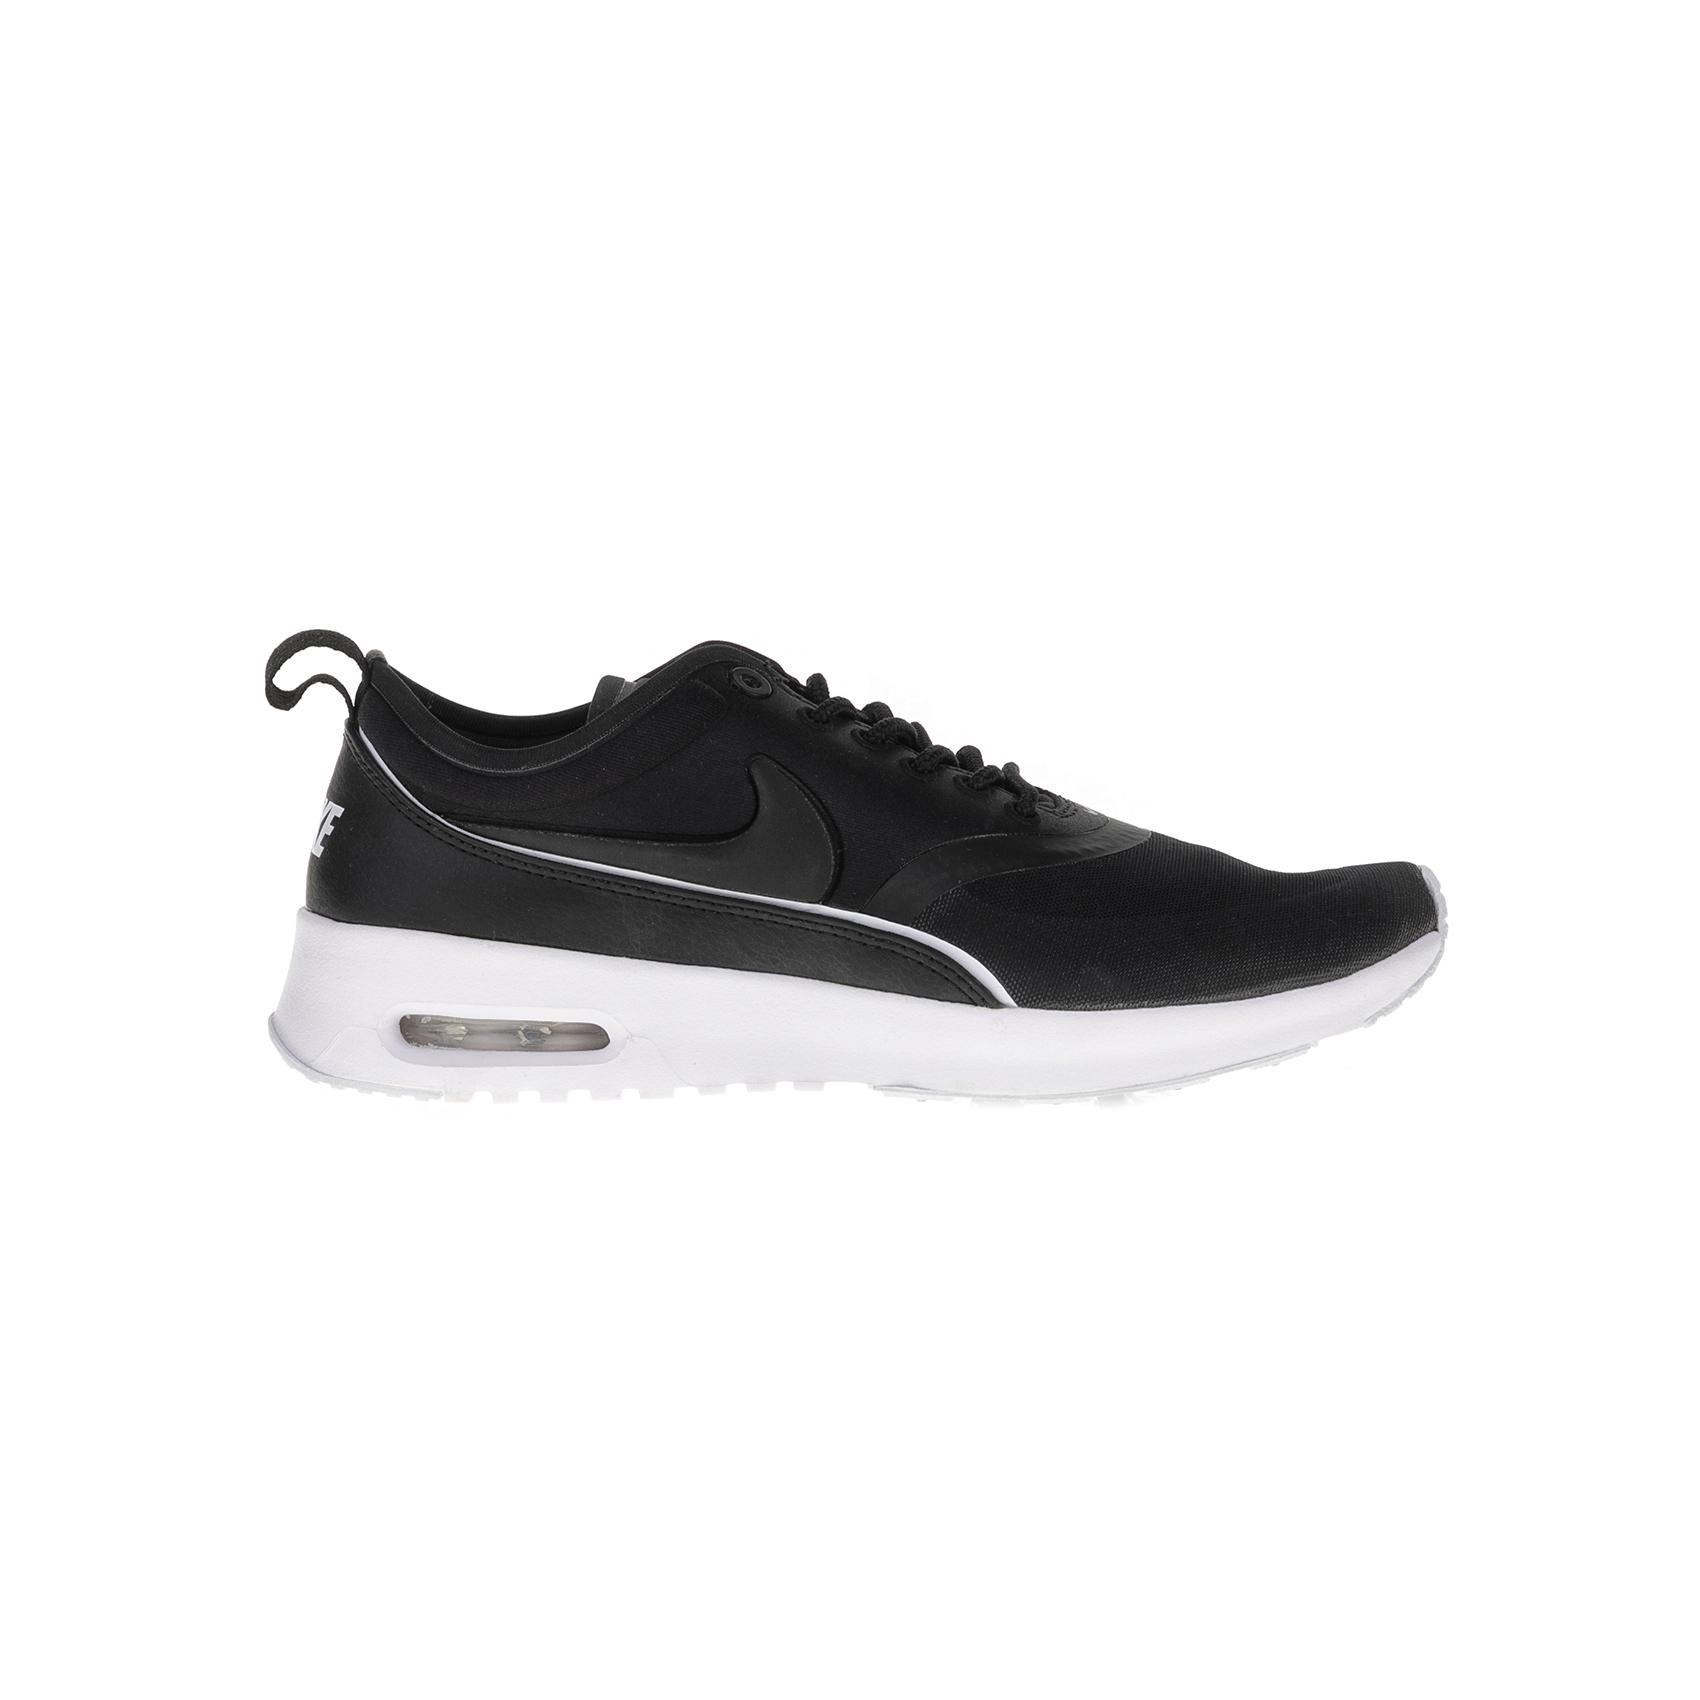 NIKE – Γυναικεία παπούτσια NIKE AIR MAX THEA ULTRA μαύρα